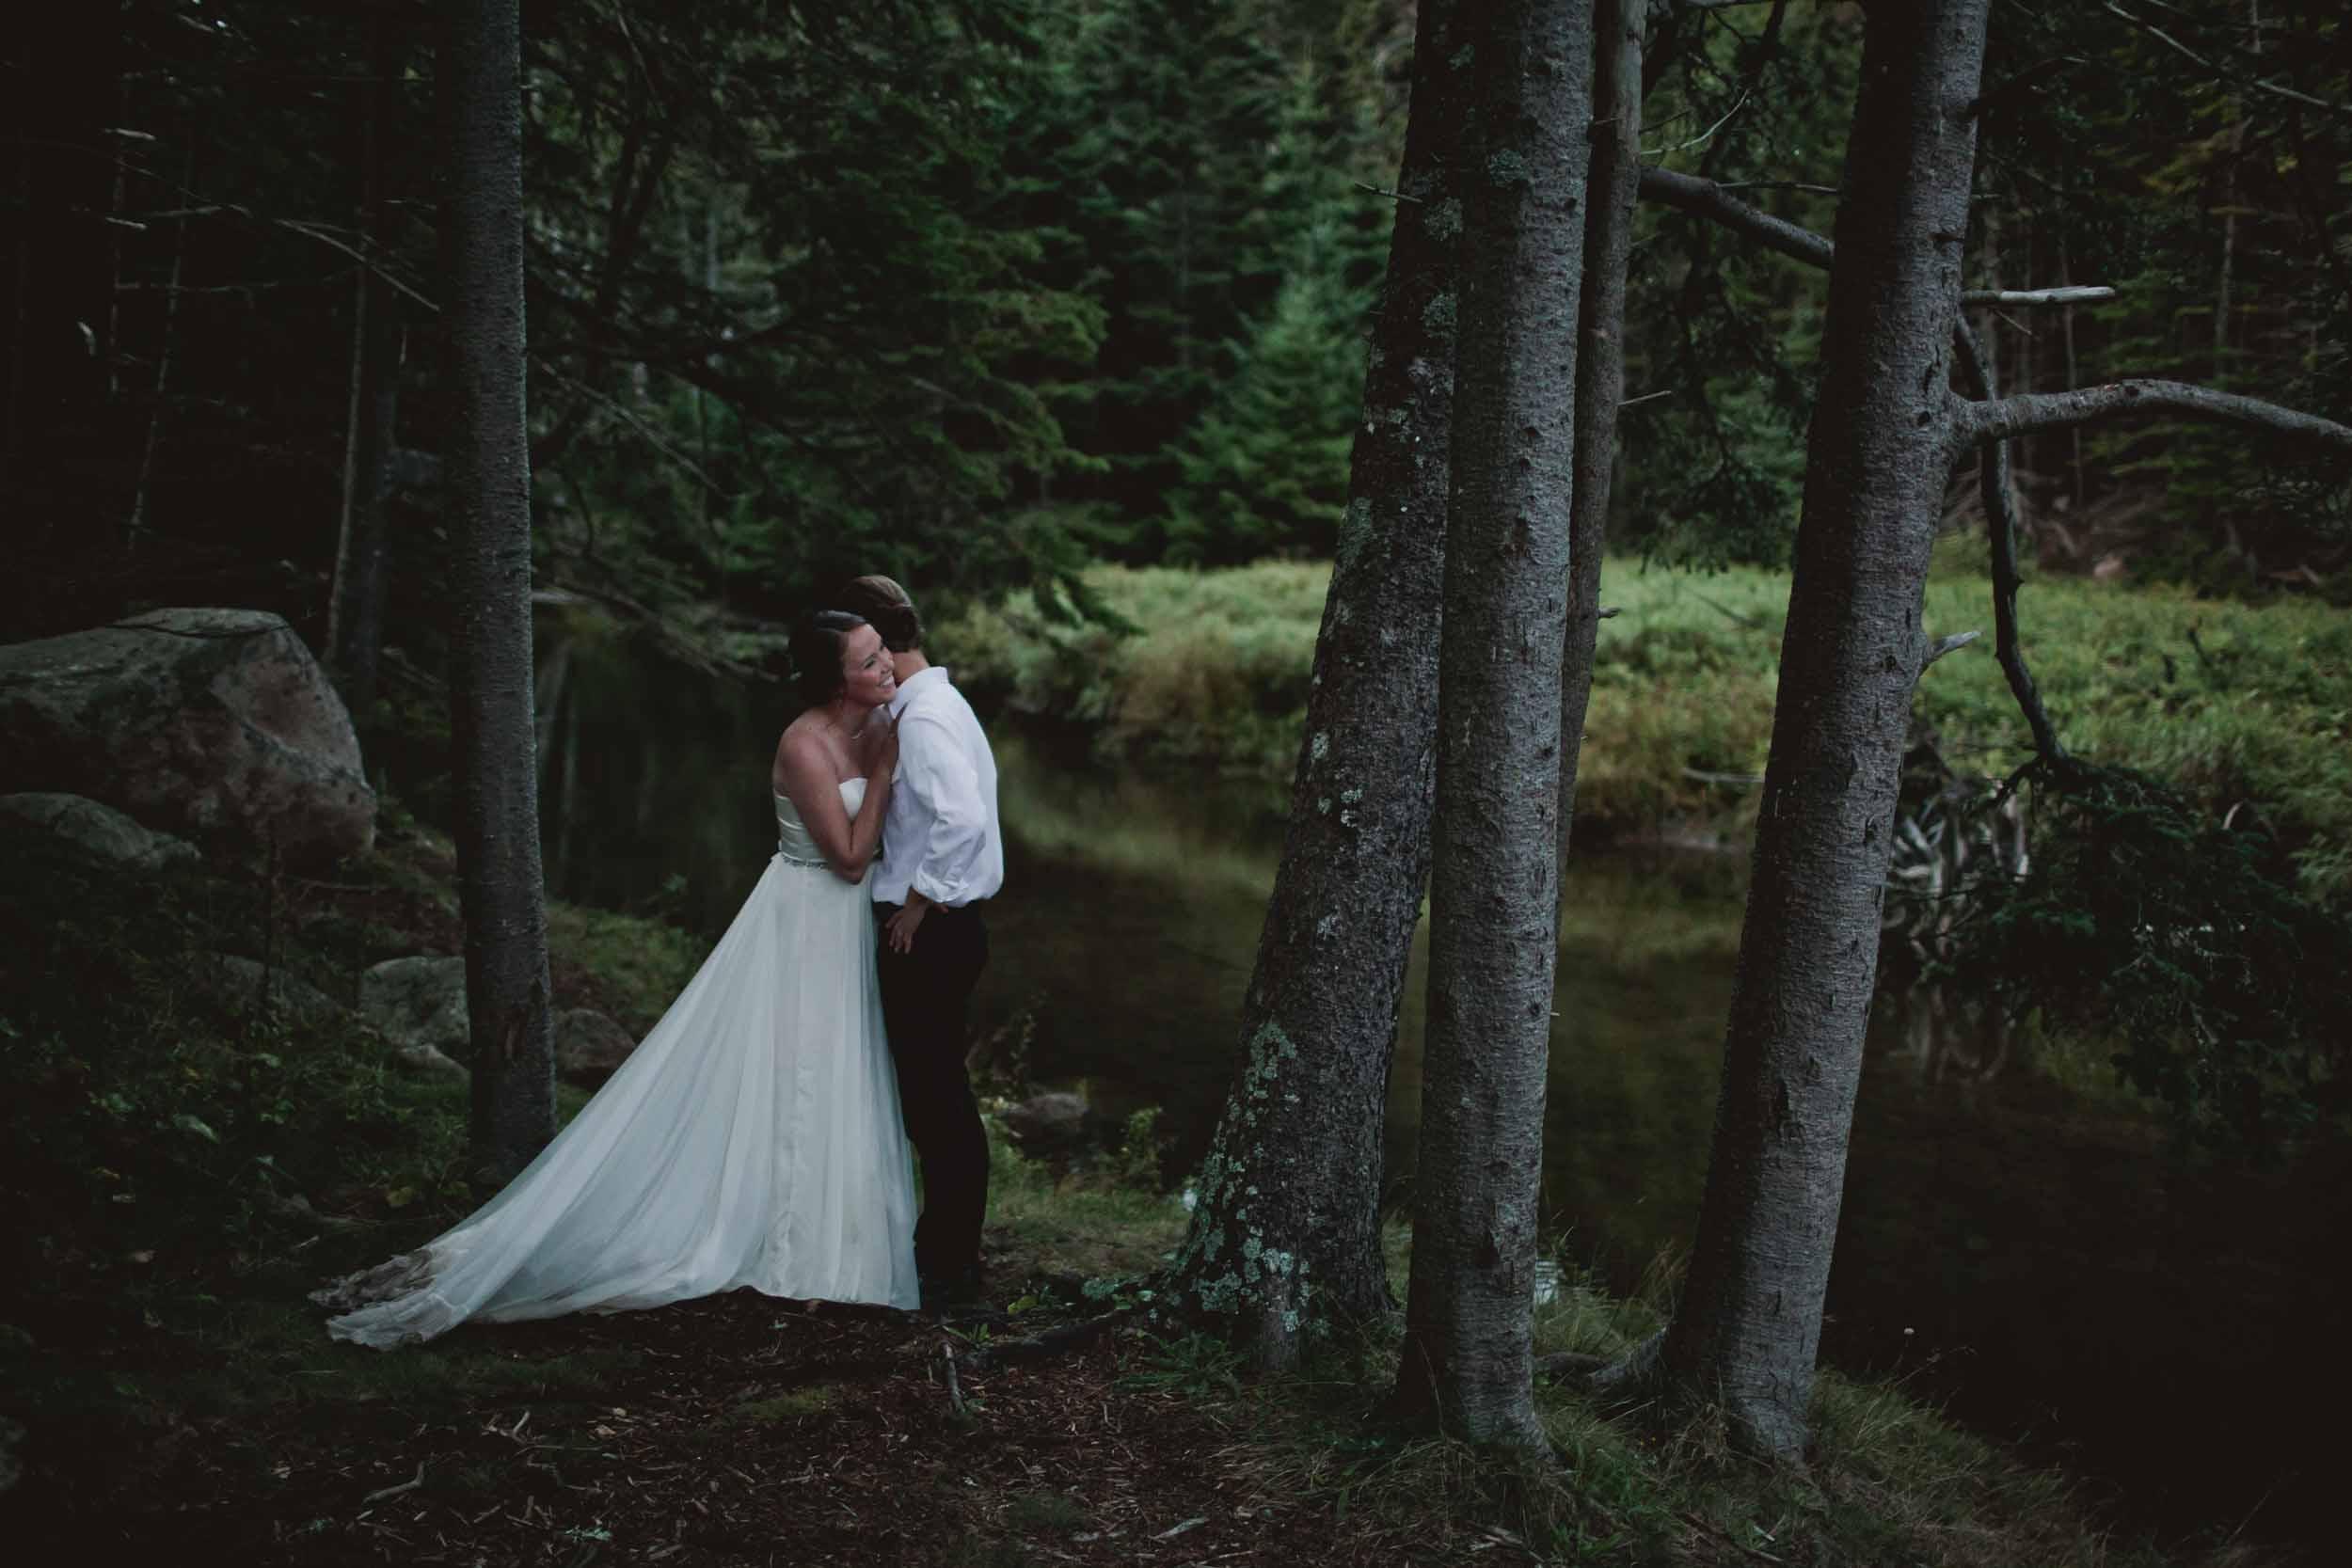 Maine-Elopement-Photographer55.jpg